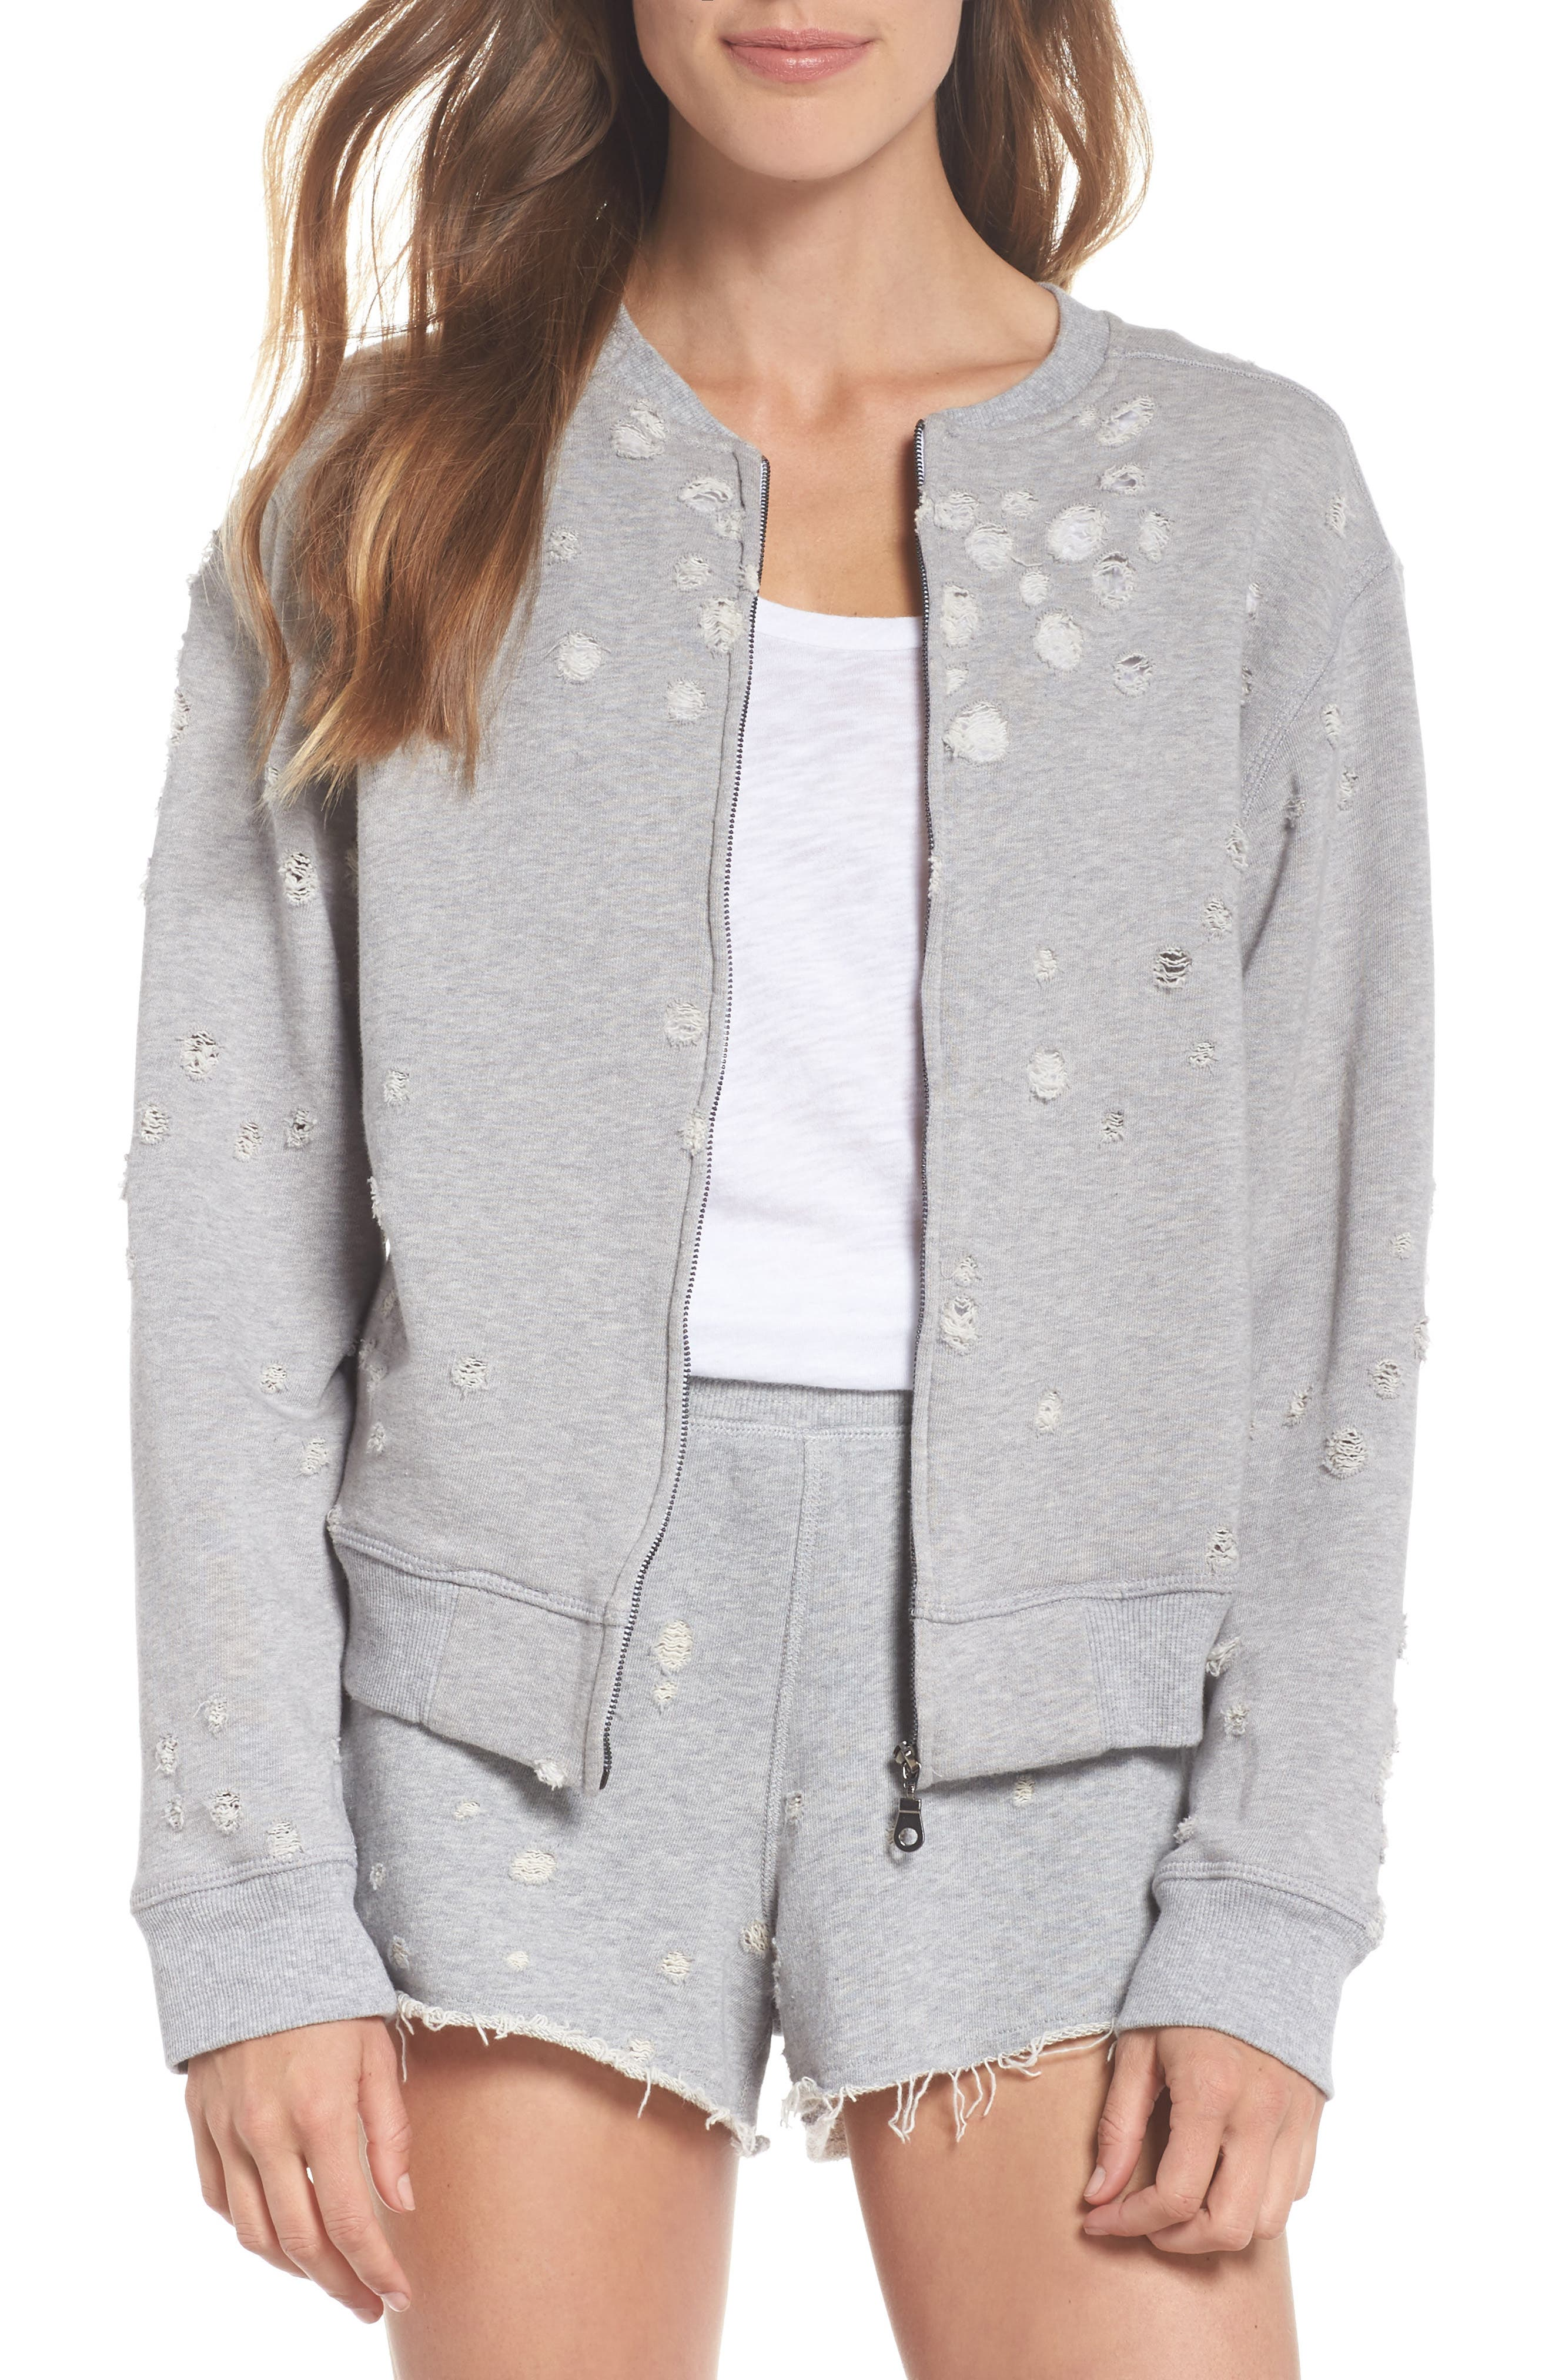 DAVID LERNER Distressed Zip Sweatshirt in Heather Grey